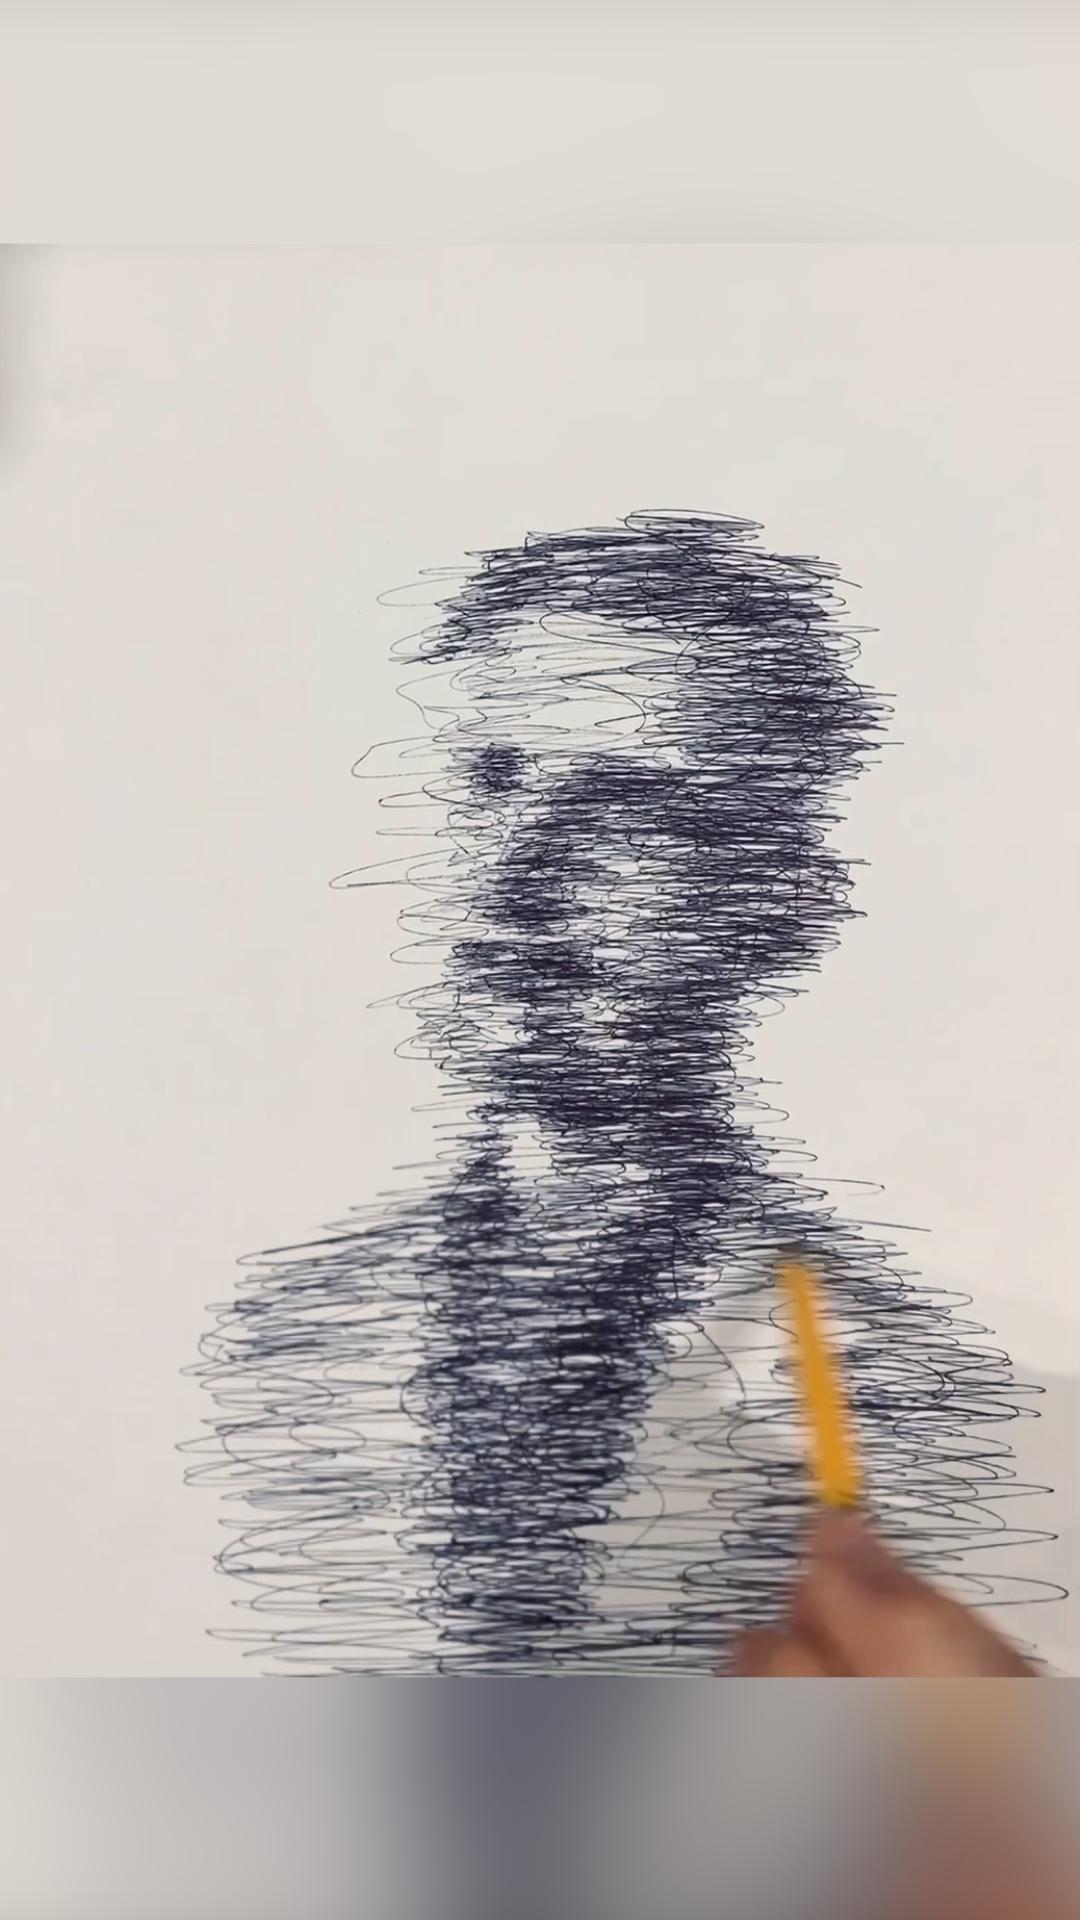 Ballpoint drawing pen time-lapse #art #artist #drawing #georgeorwell